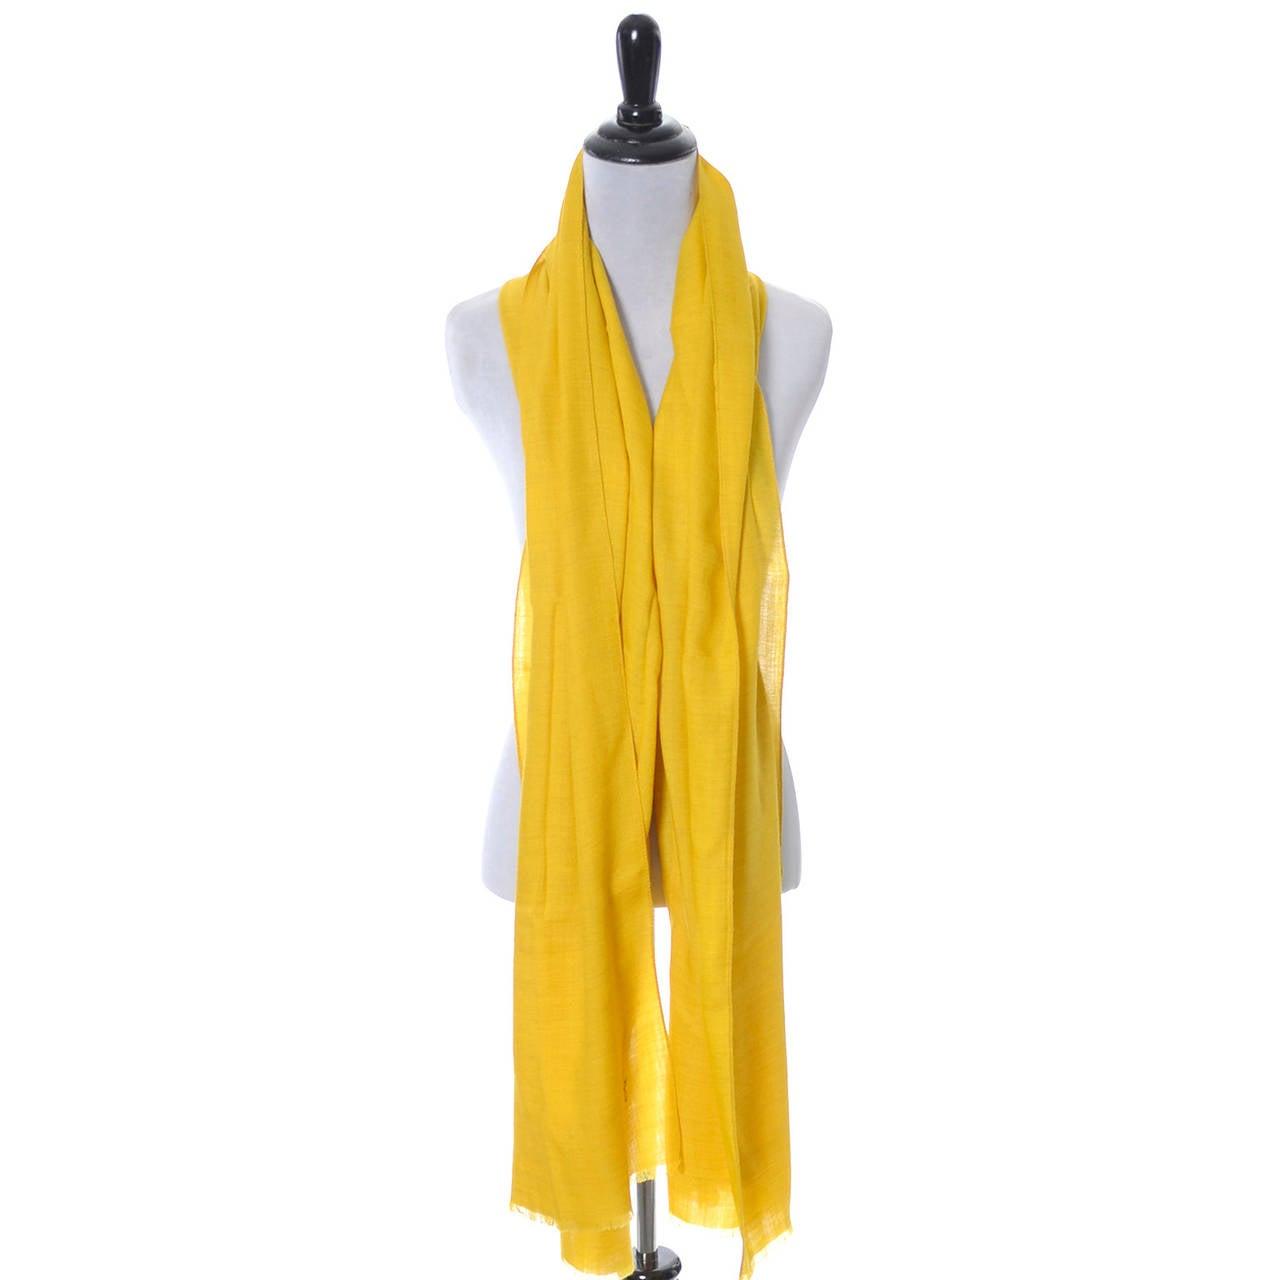 "Women's Kenzo Paris Signature Logo Vintage Scarf Mustard Yellow Wool 80"" Long For Sale"